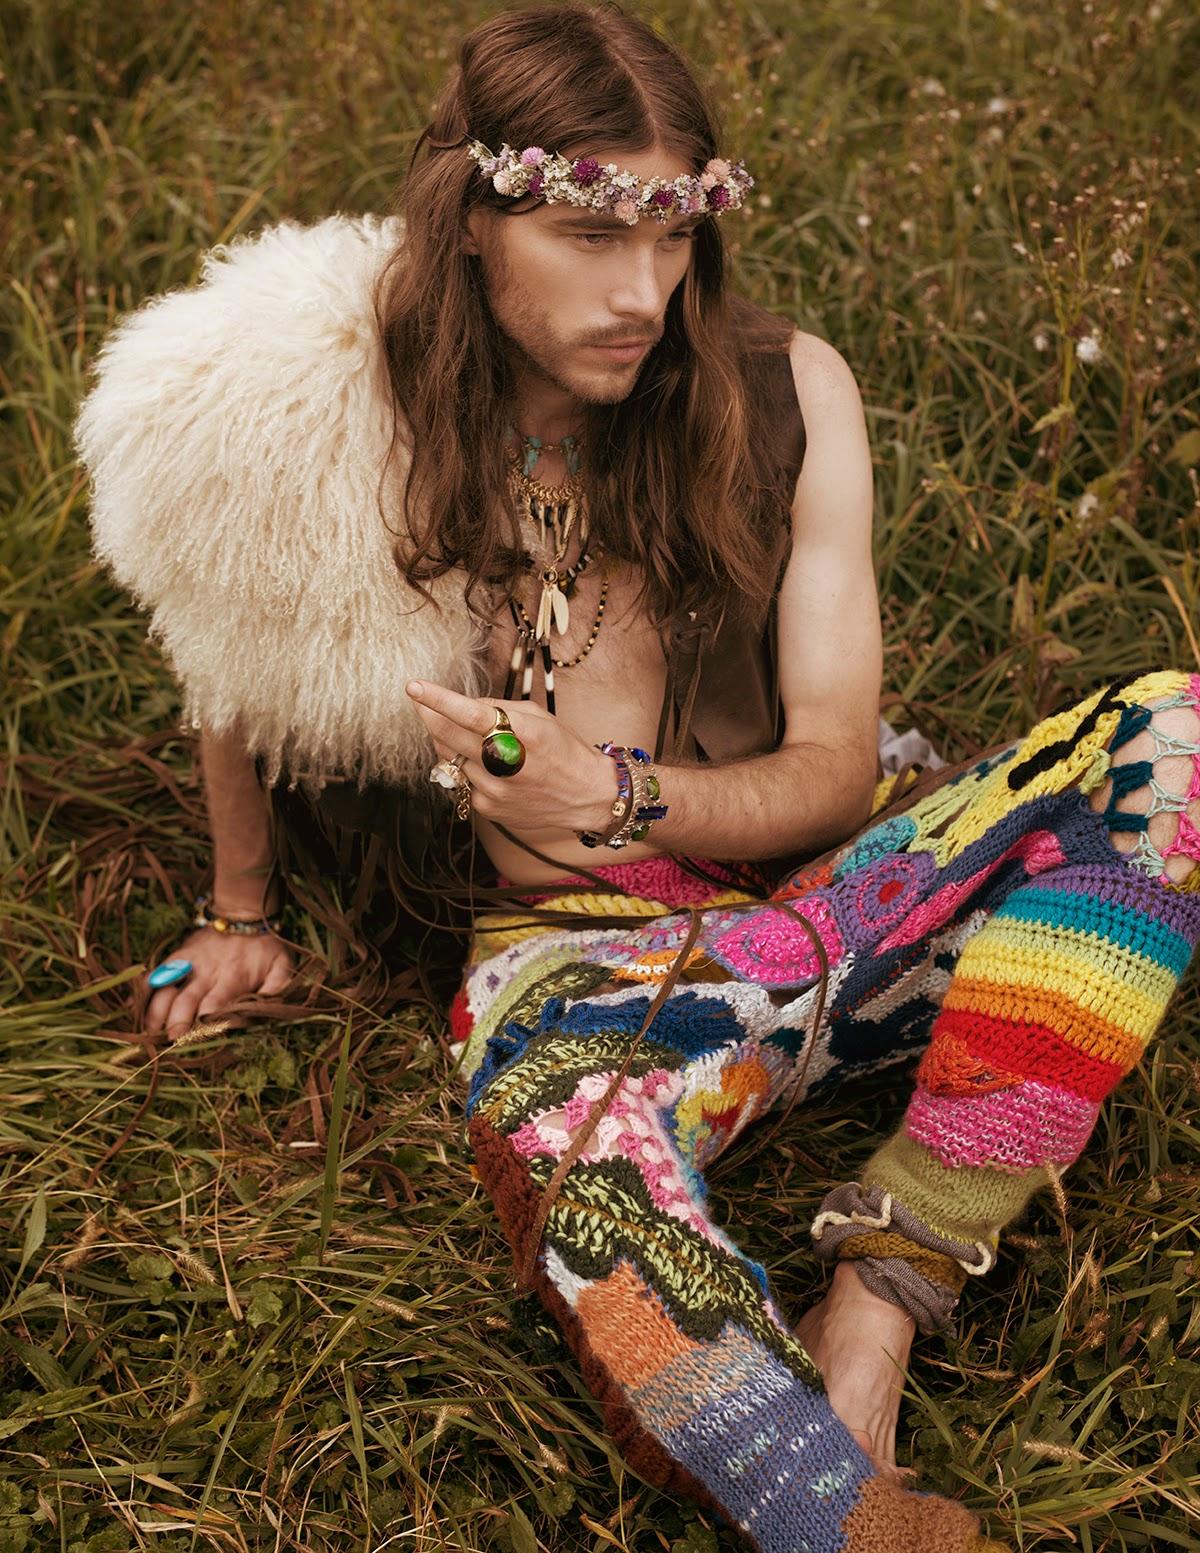 Nude Hippie Chicks